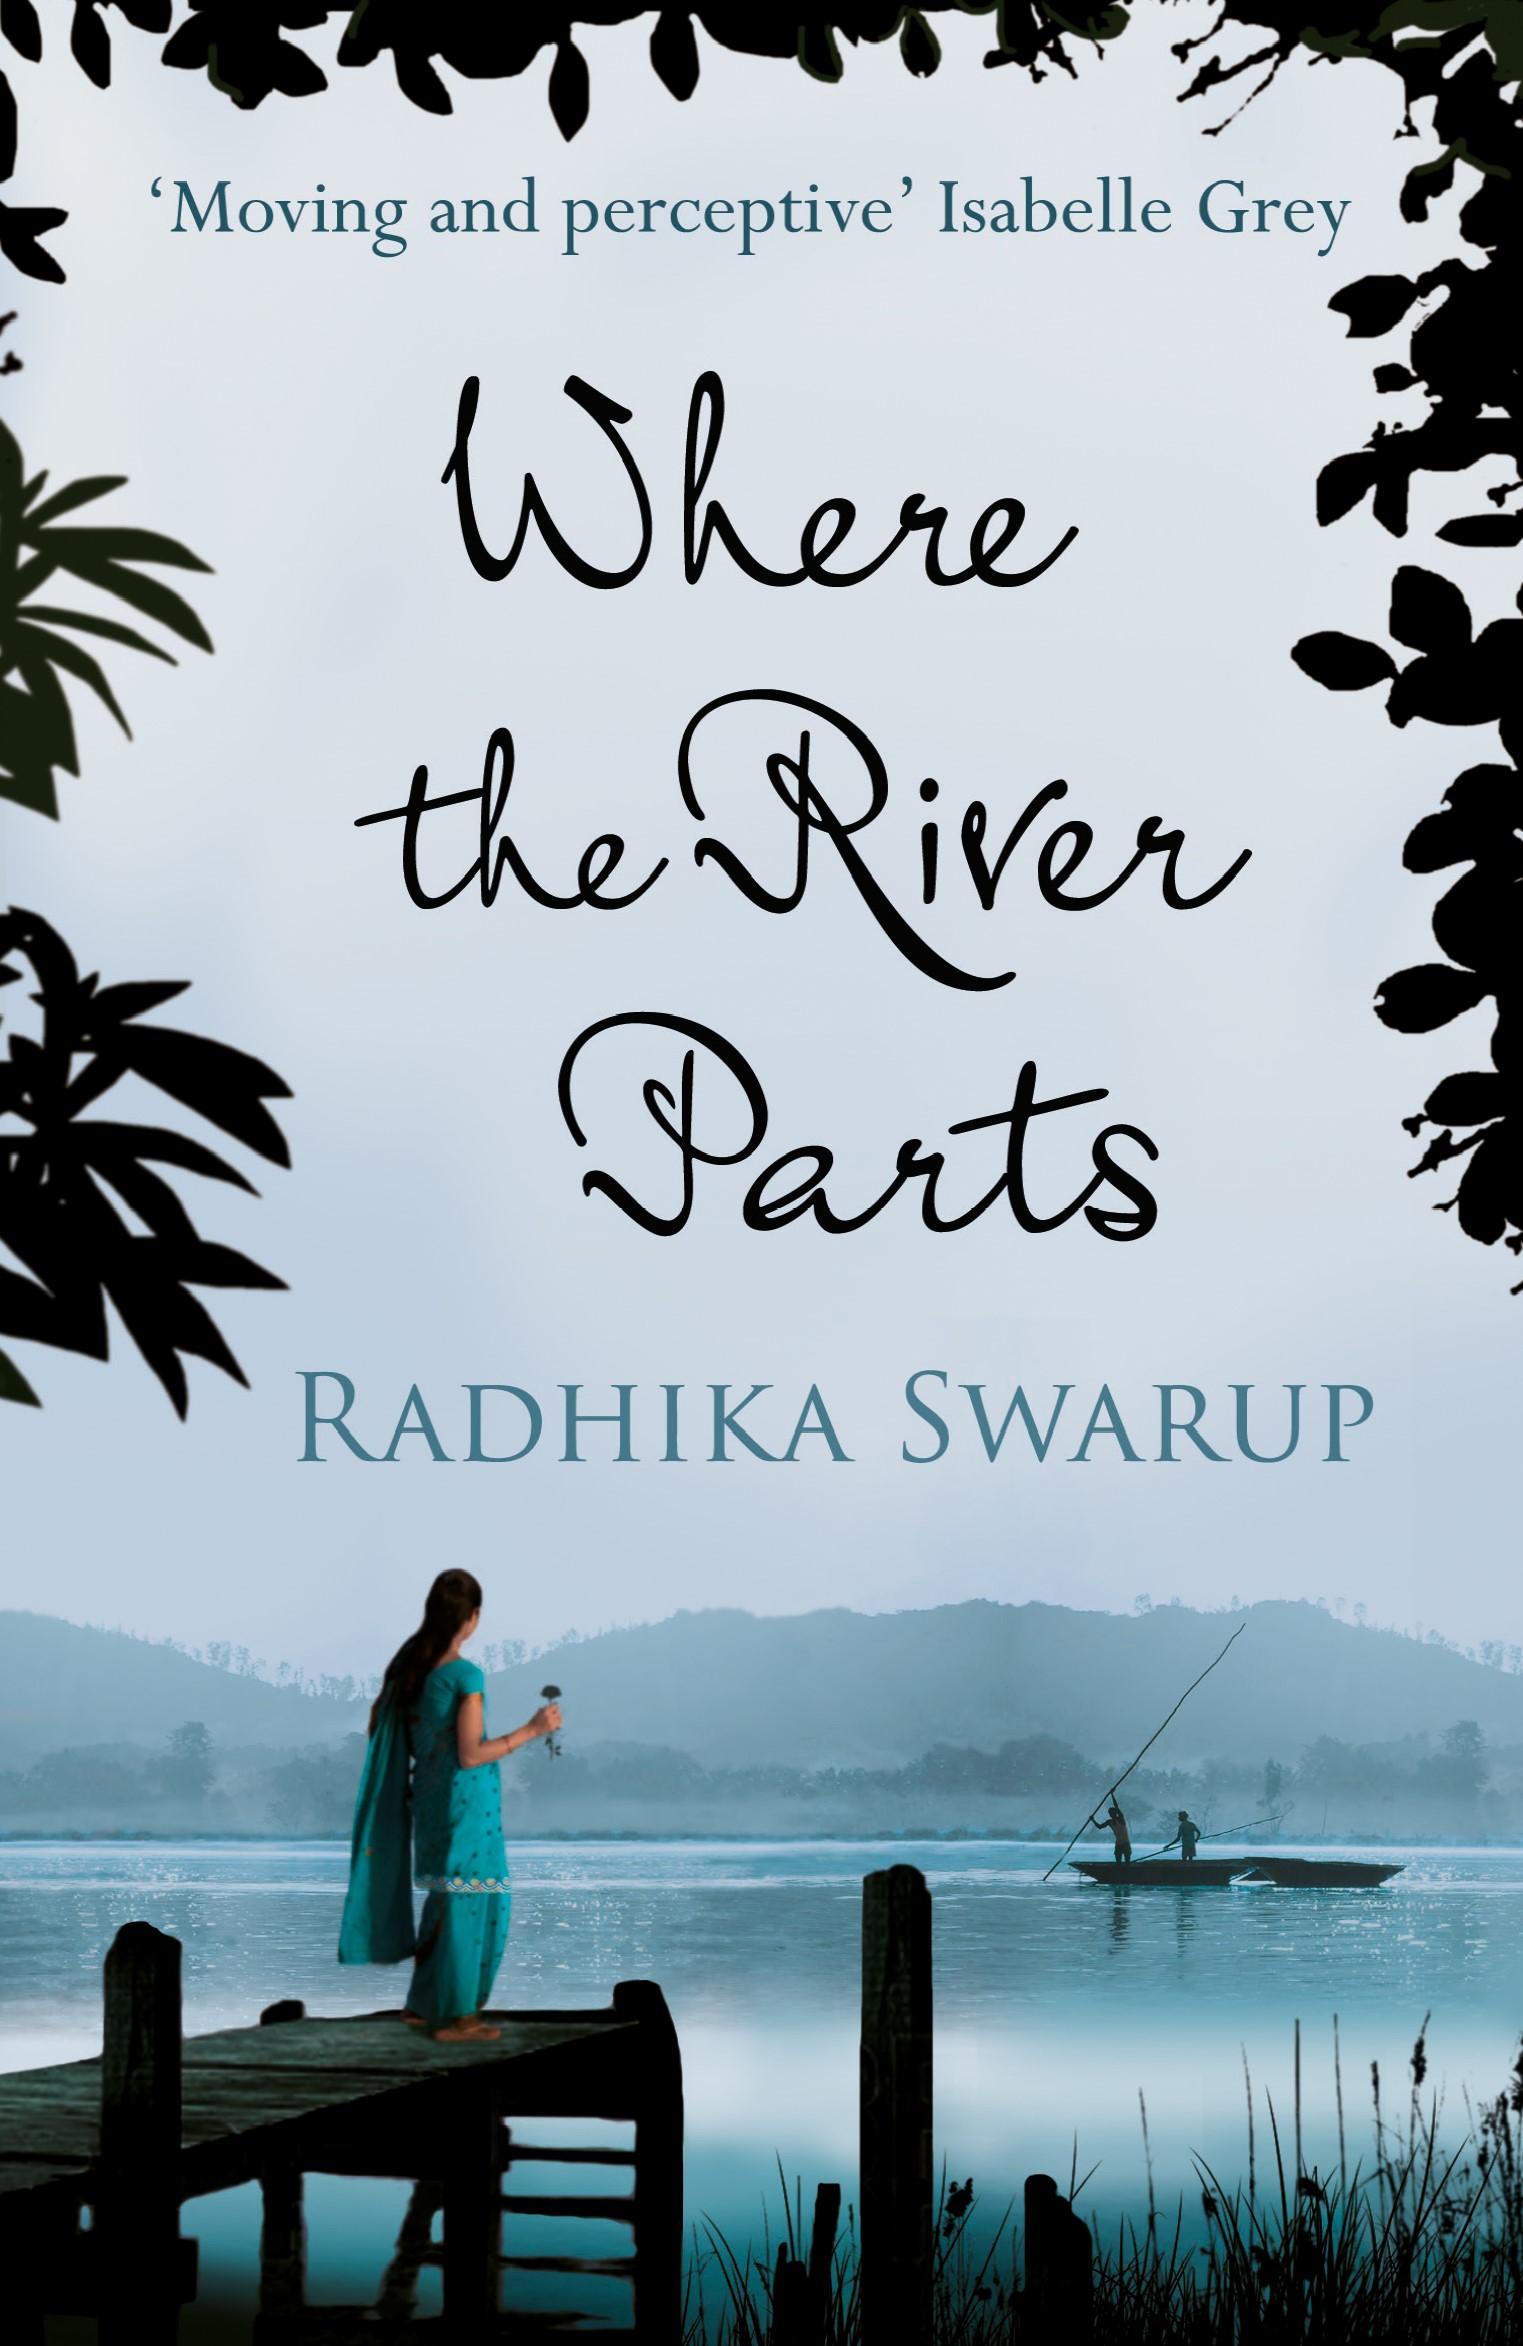 Radhika Swarup Q&A